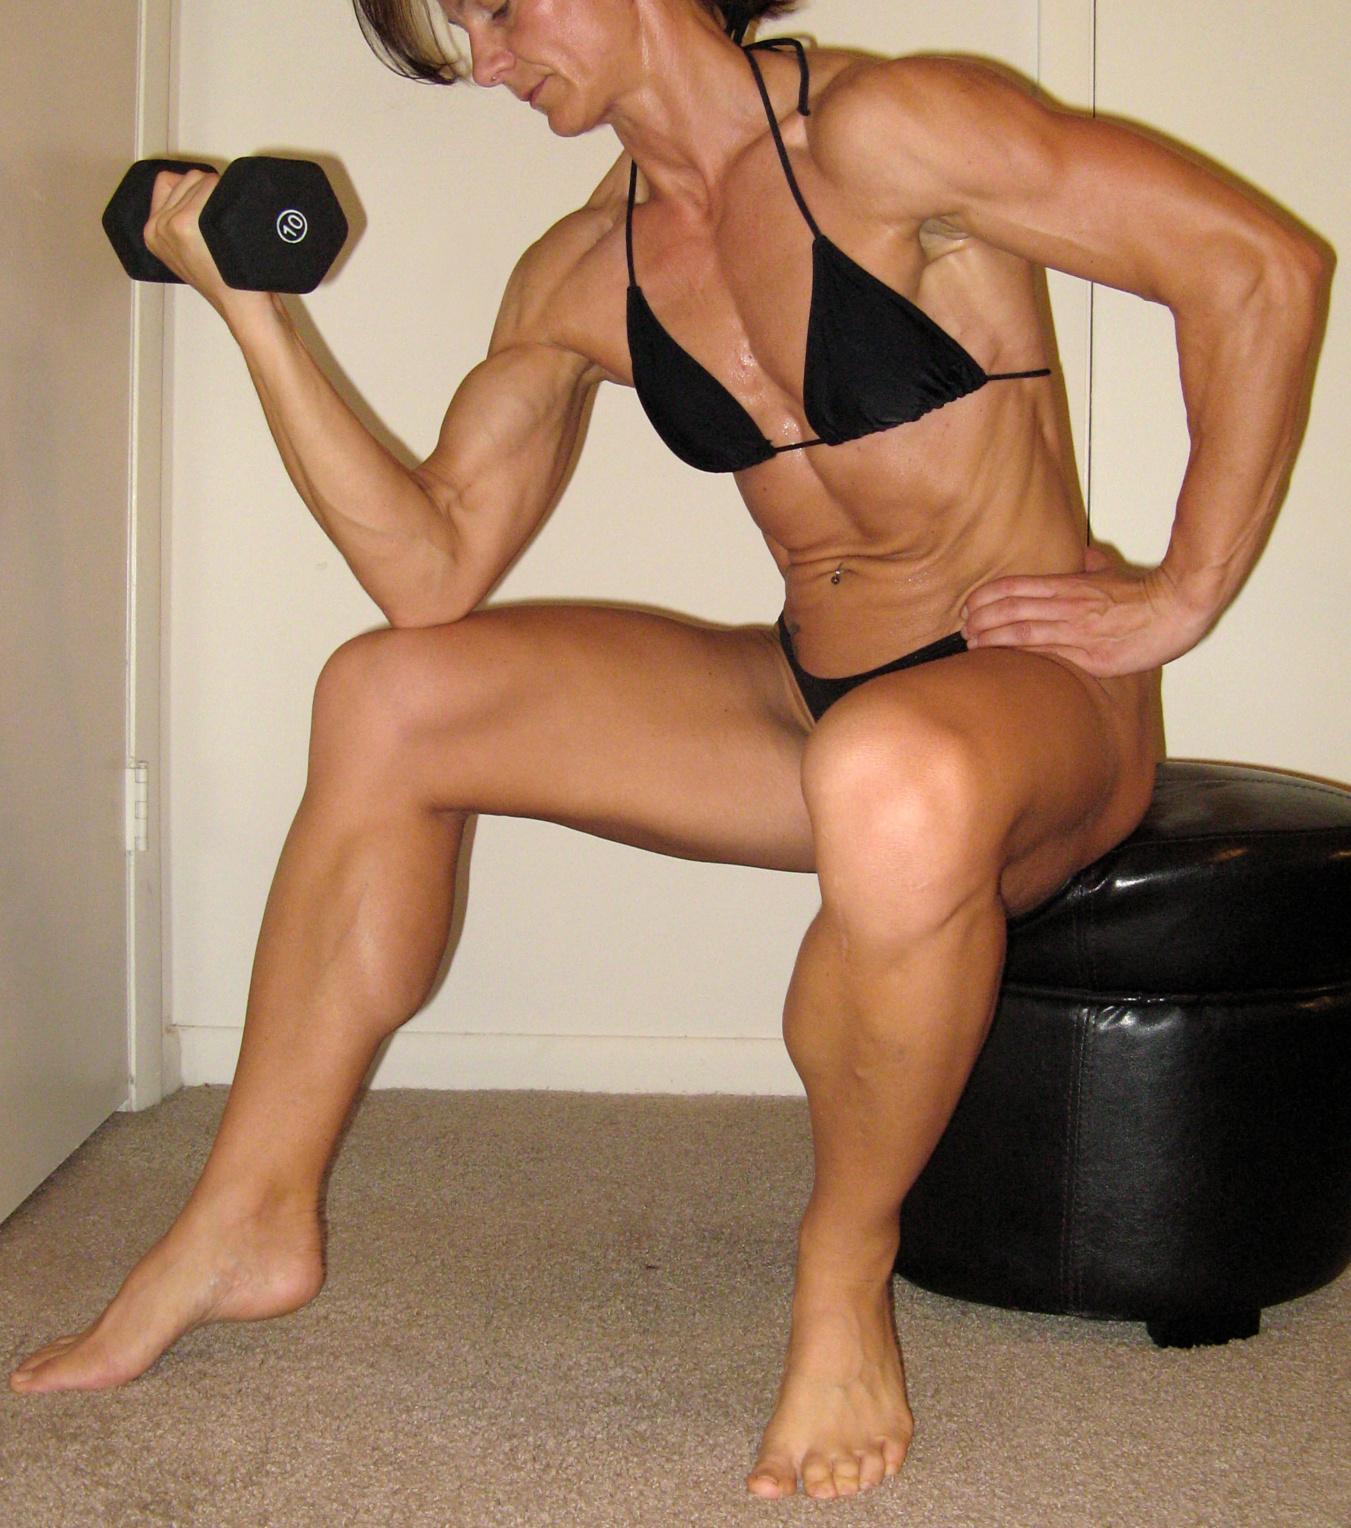 Asian girls flexing biceps